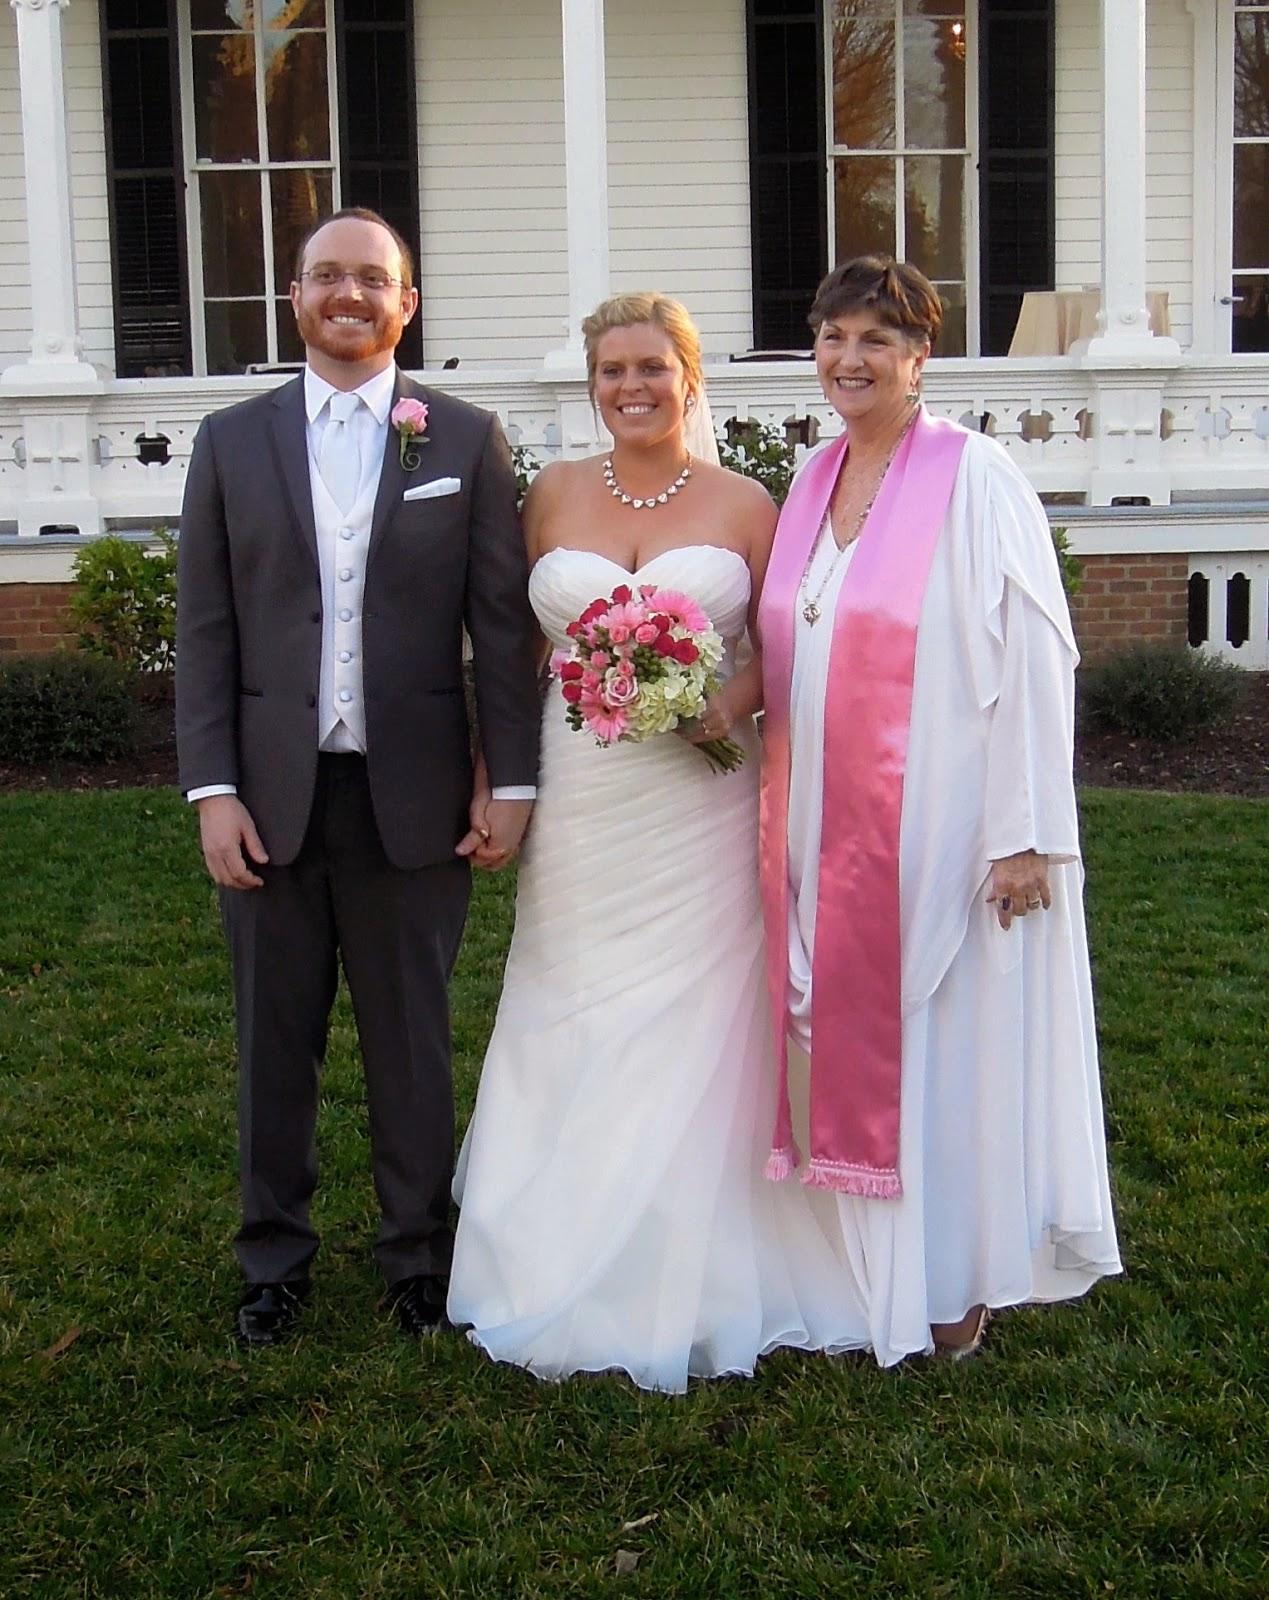 Raleigh Wedding Blog: Wonderful Winter Wedding for Jamie ...